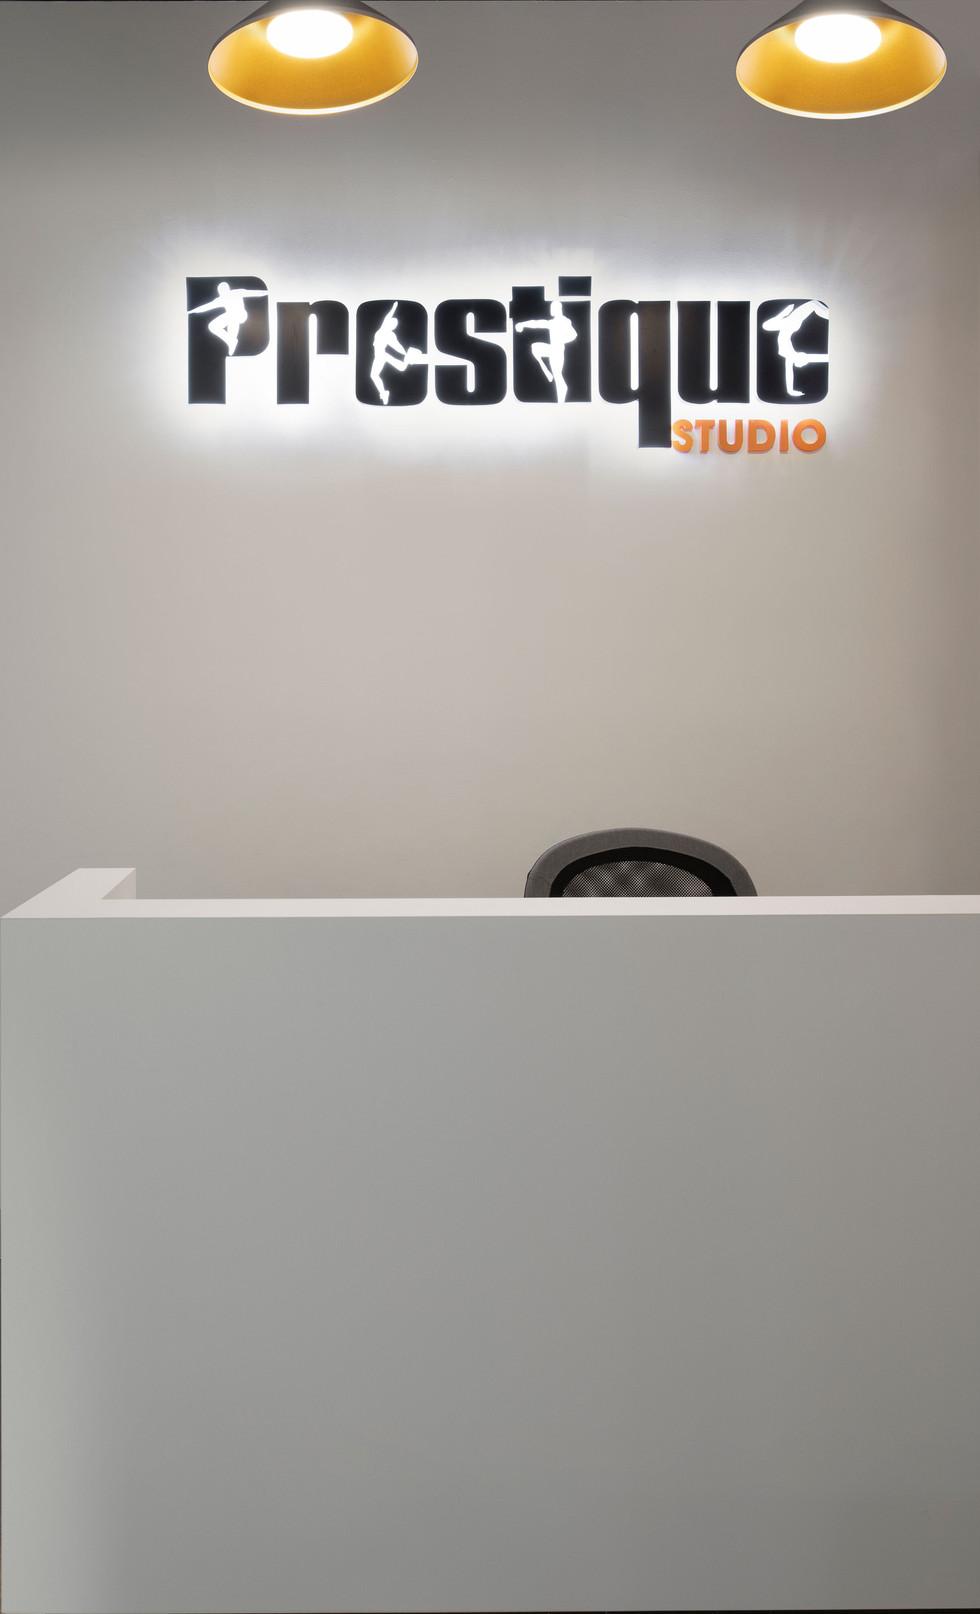 Prestique11.jpg